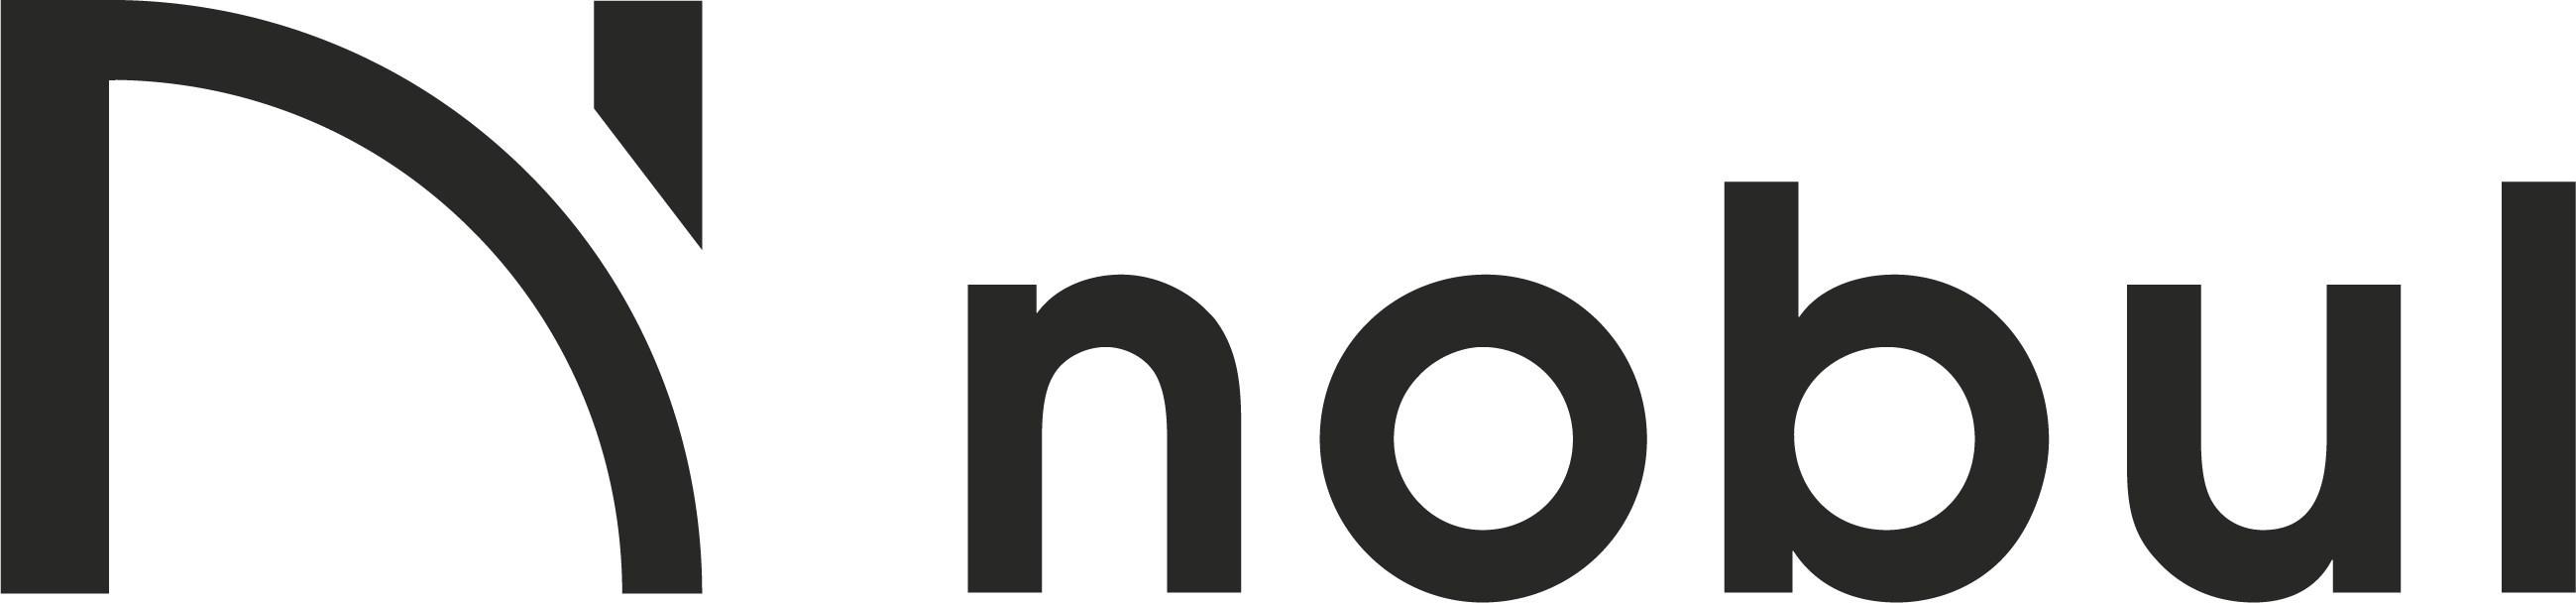 00b142e555a389 Nobul Nobul Corporation Launches Next Generation Online Real Est.jpg p publish